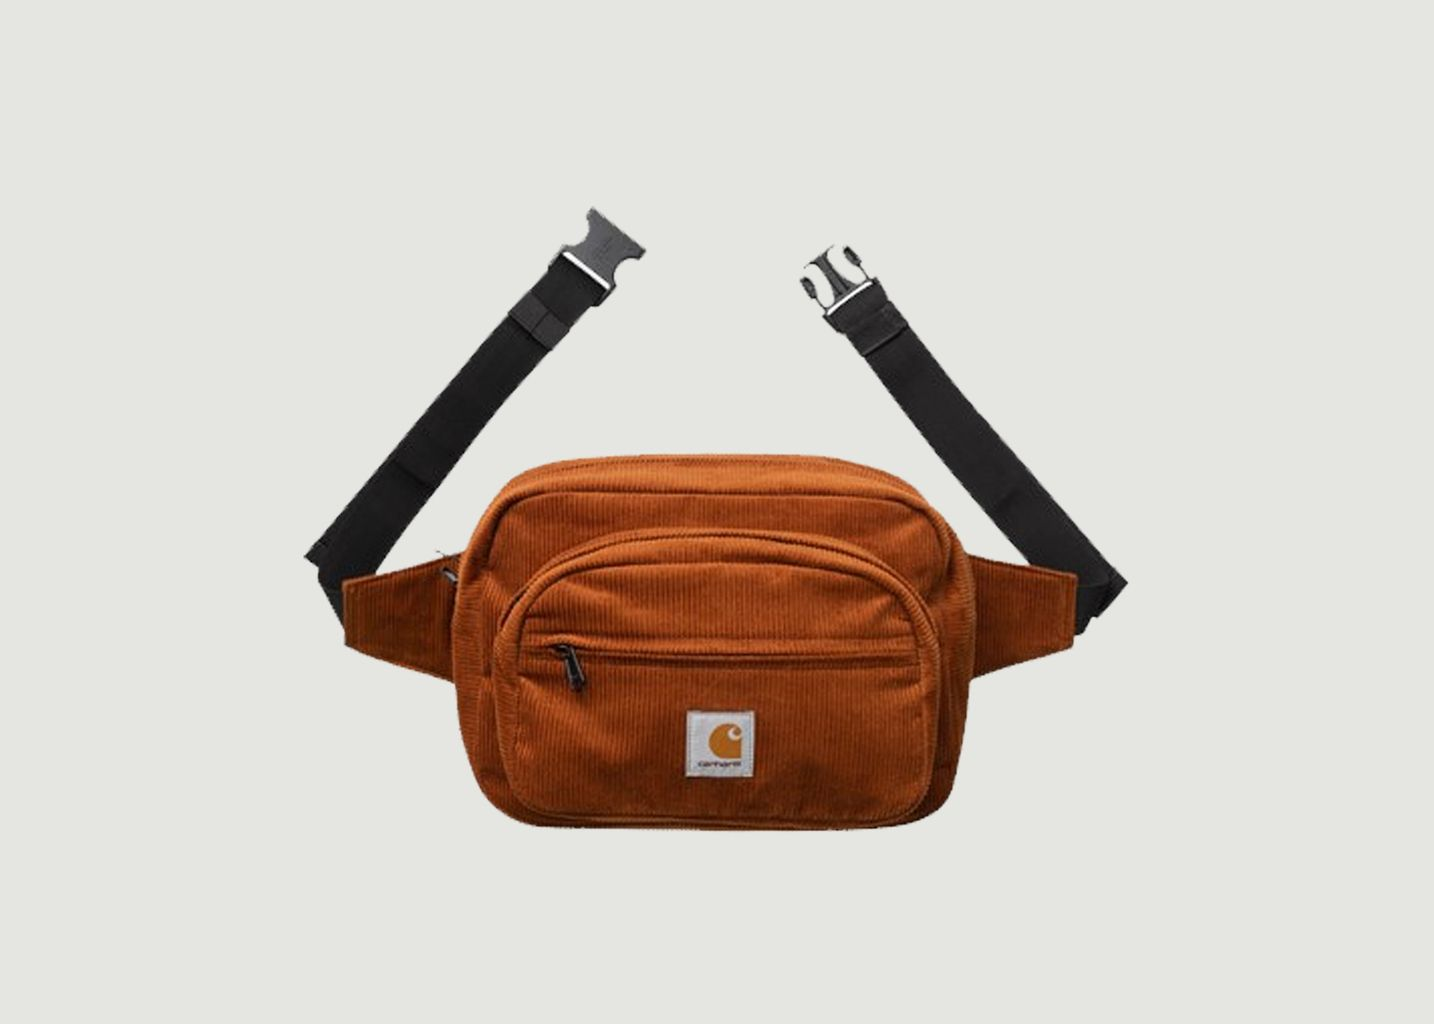 Sac Cord hip Bag - Carhartt WIP